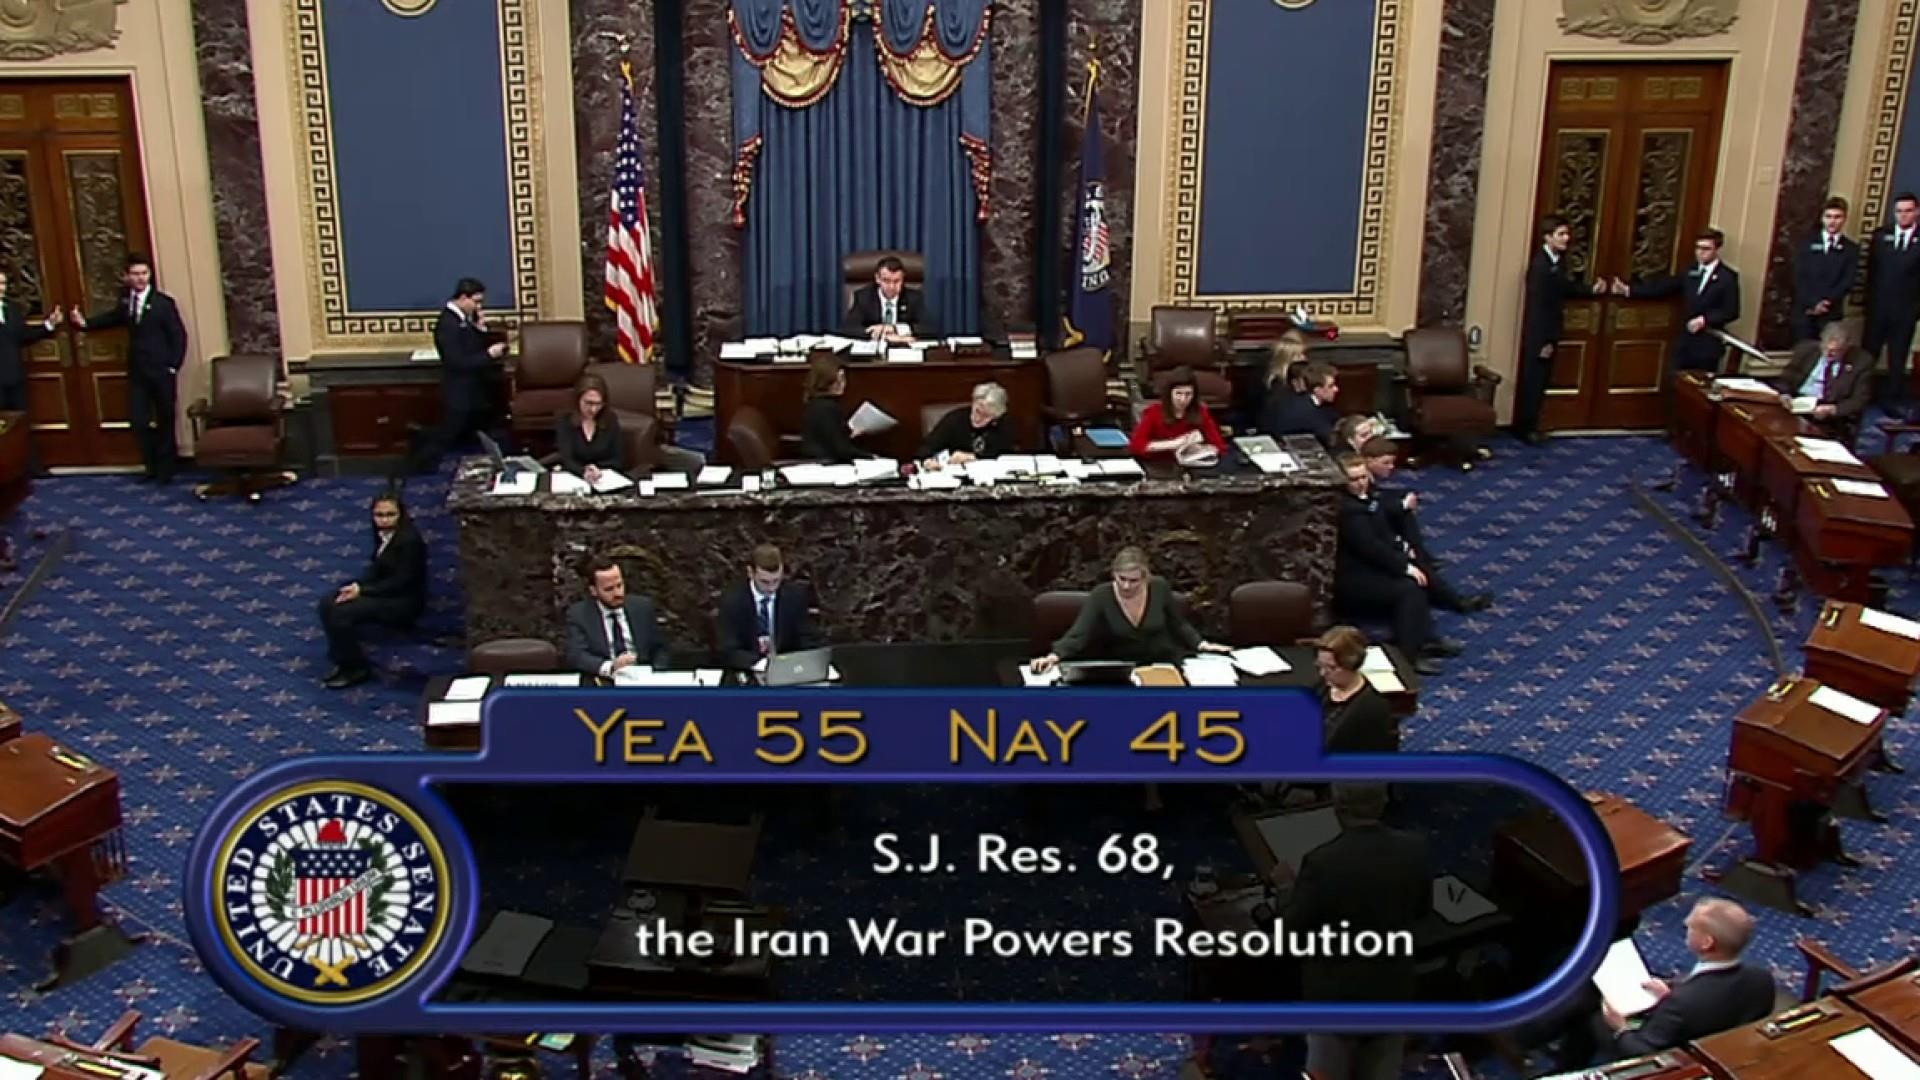 8 Senate Republicans join Democrats to pass Iran war powers resolution